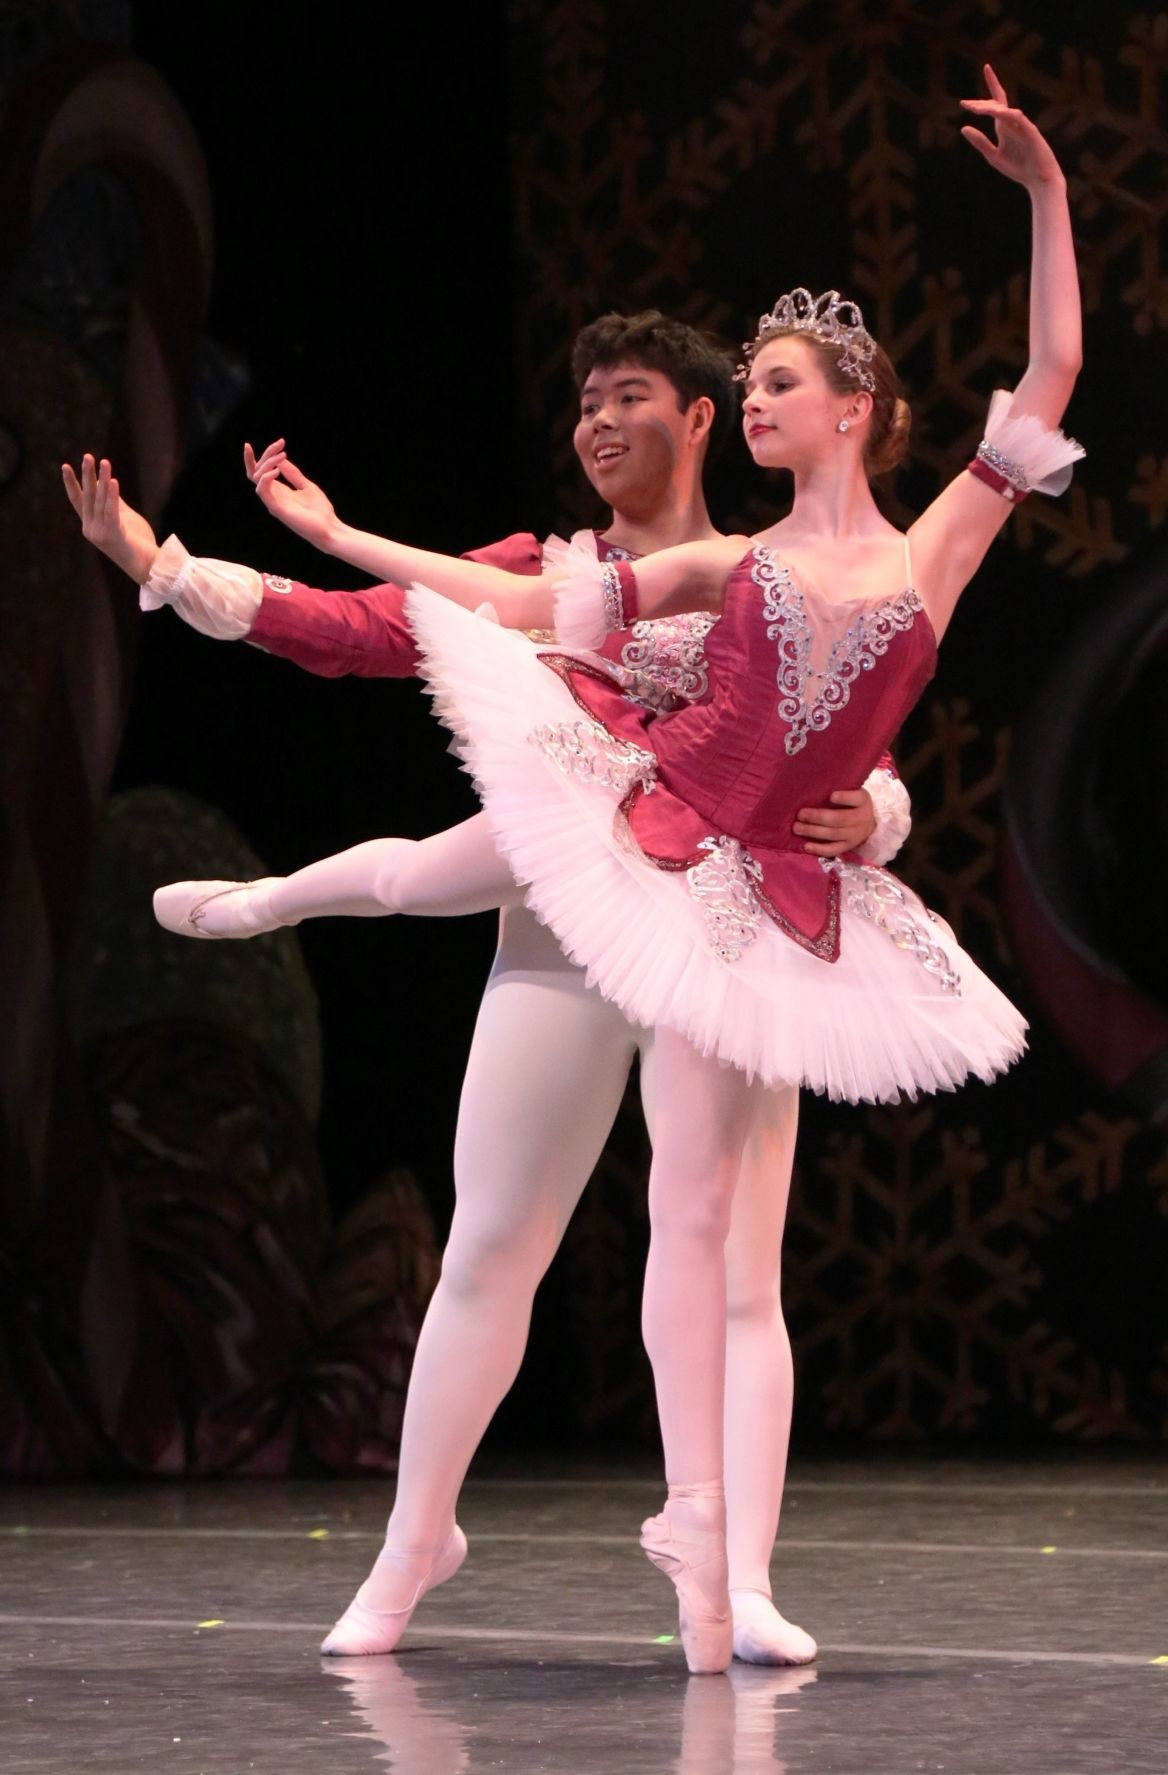 Southwest Virginia Ballet _ Sugar Plum and Cavalier.jpg